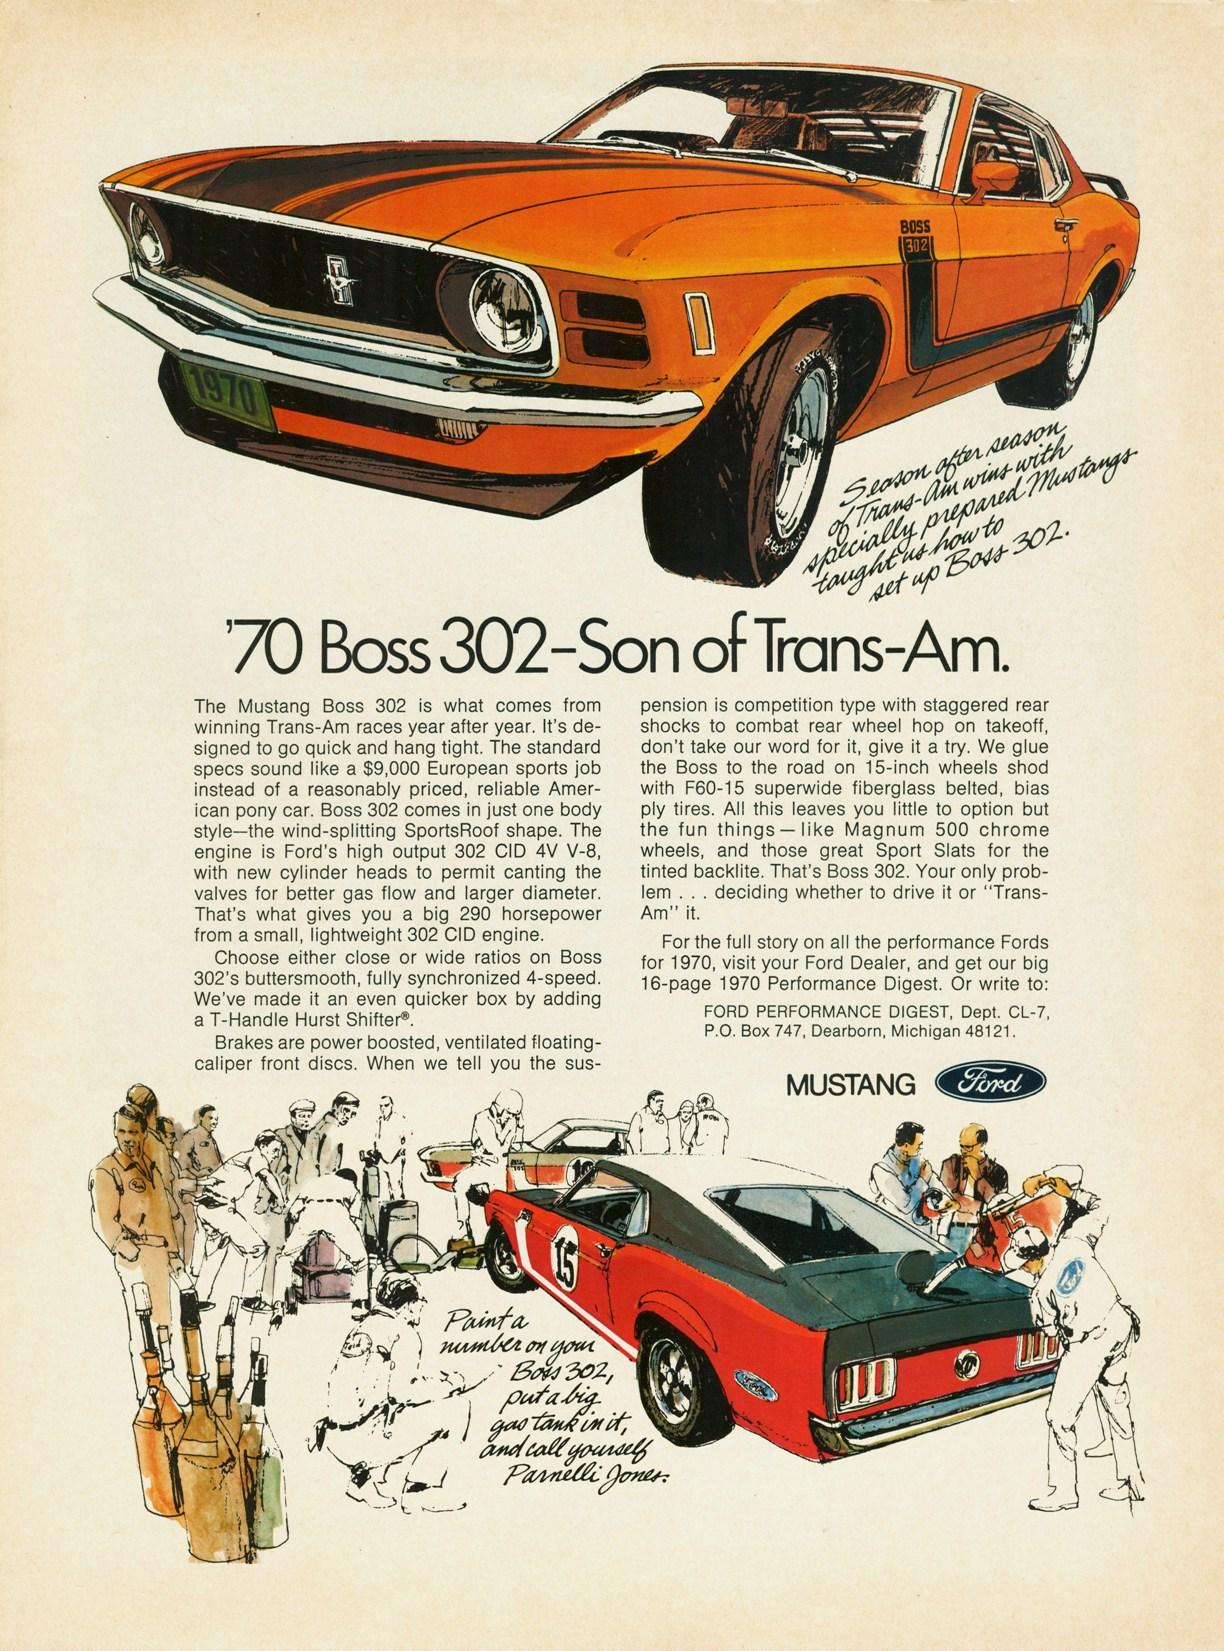 1969 Mustang Boss 302 - son of Trans-Am